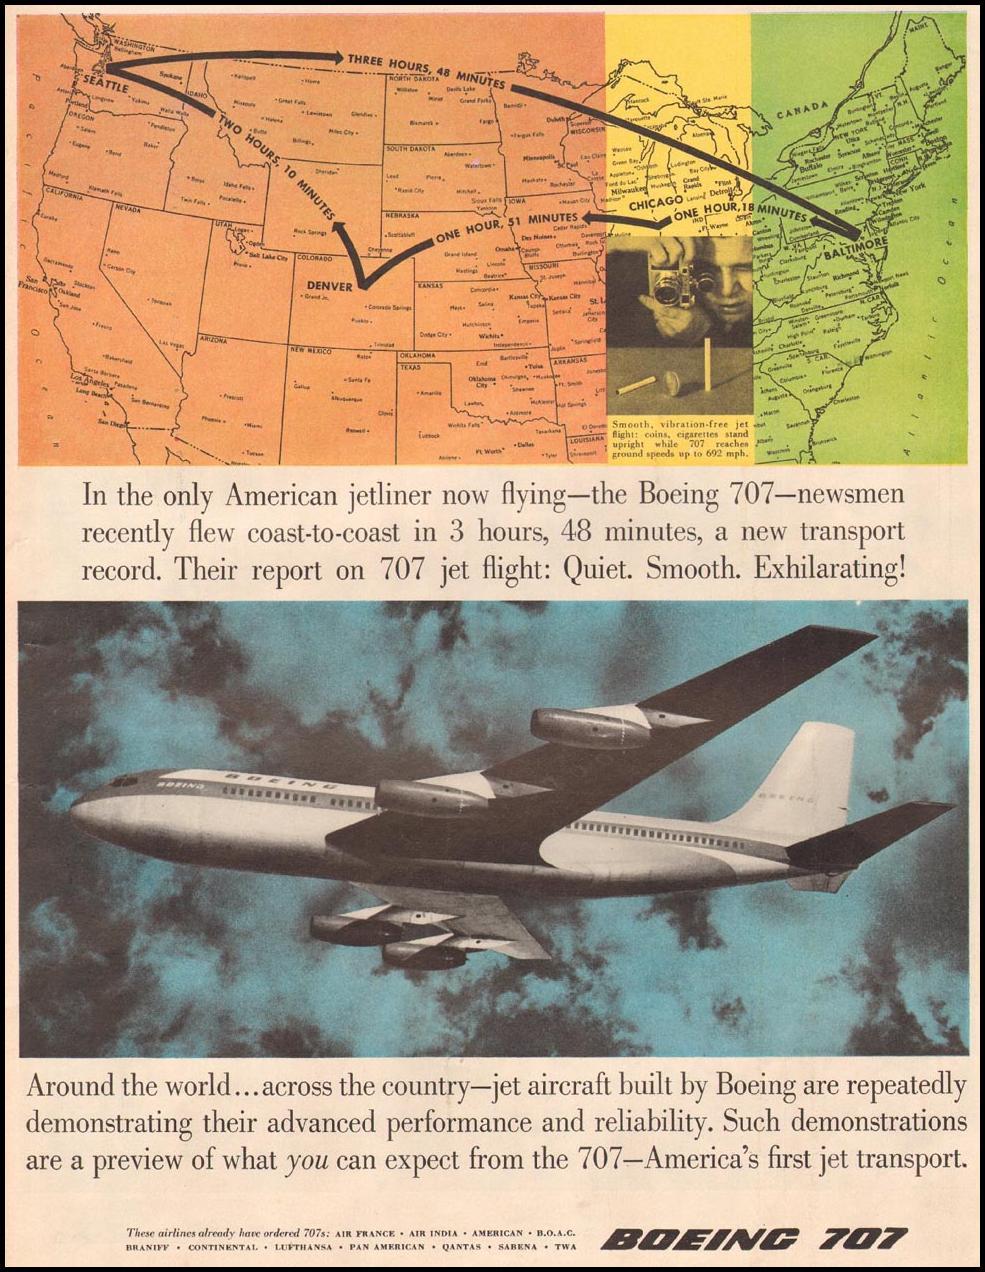 BOEING 707 LIFE 09/09/1957 p. 5